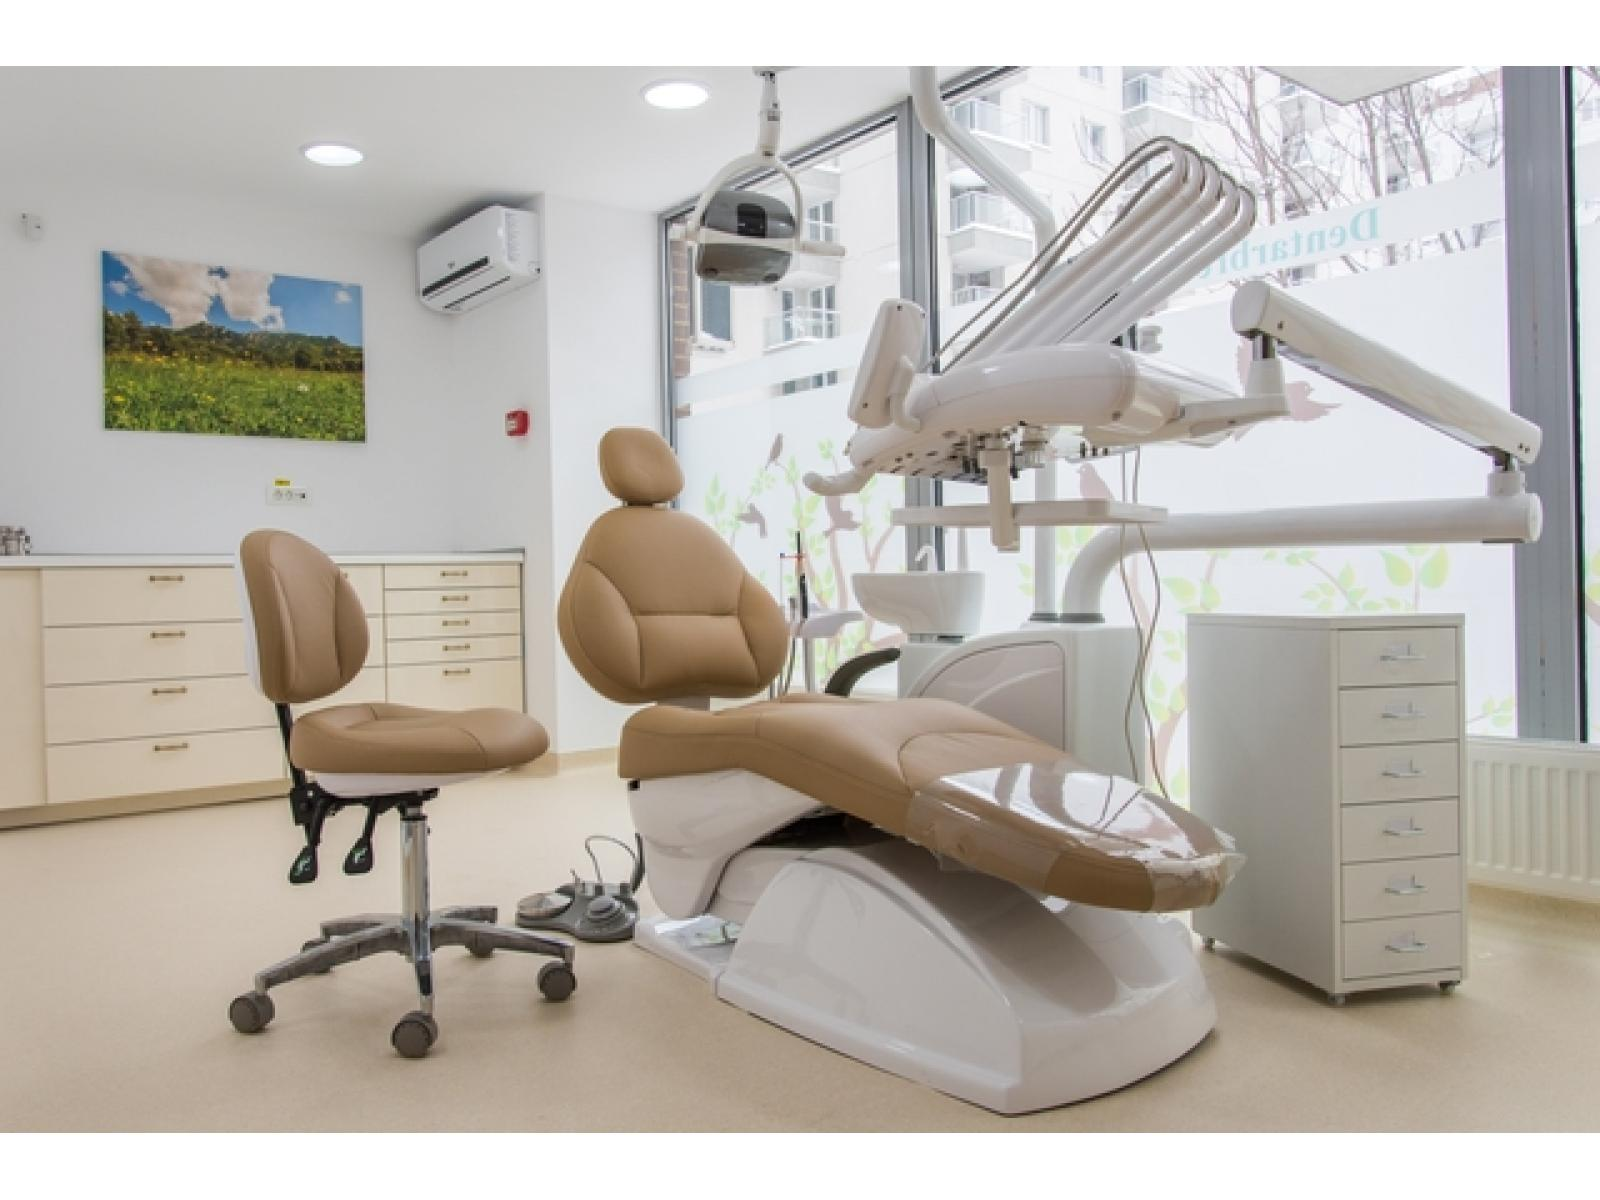 Dentarbre Dental Clinic - Cabinet_Stomatologic_sector_2_-_Dentarbre_Dental_Clinic_-_www.dentarbre.com.jpg